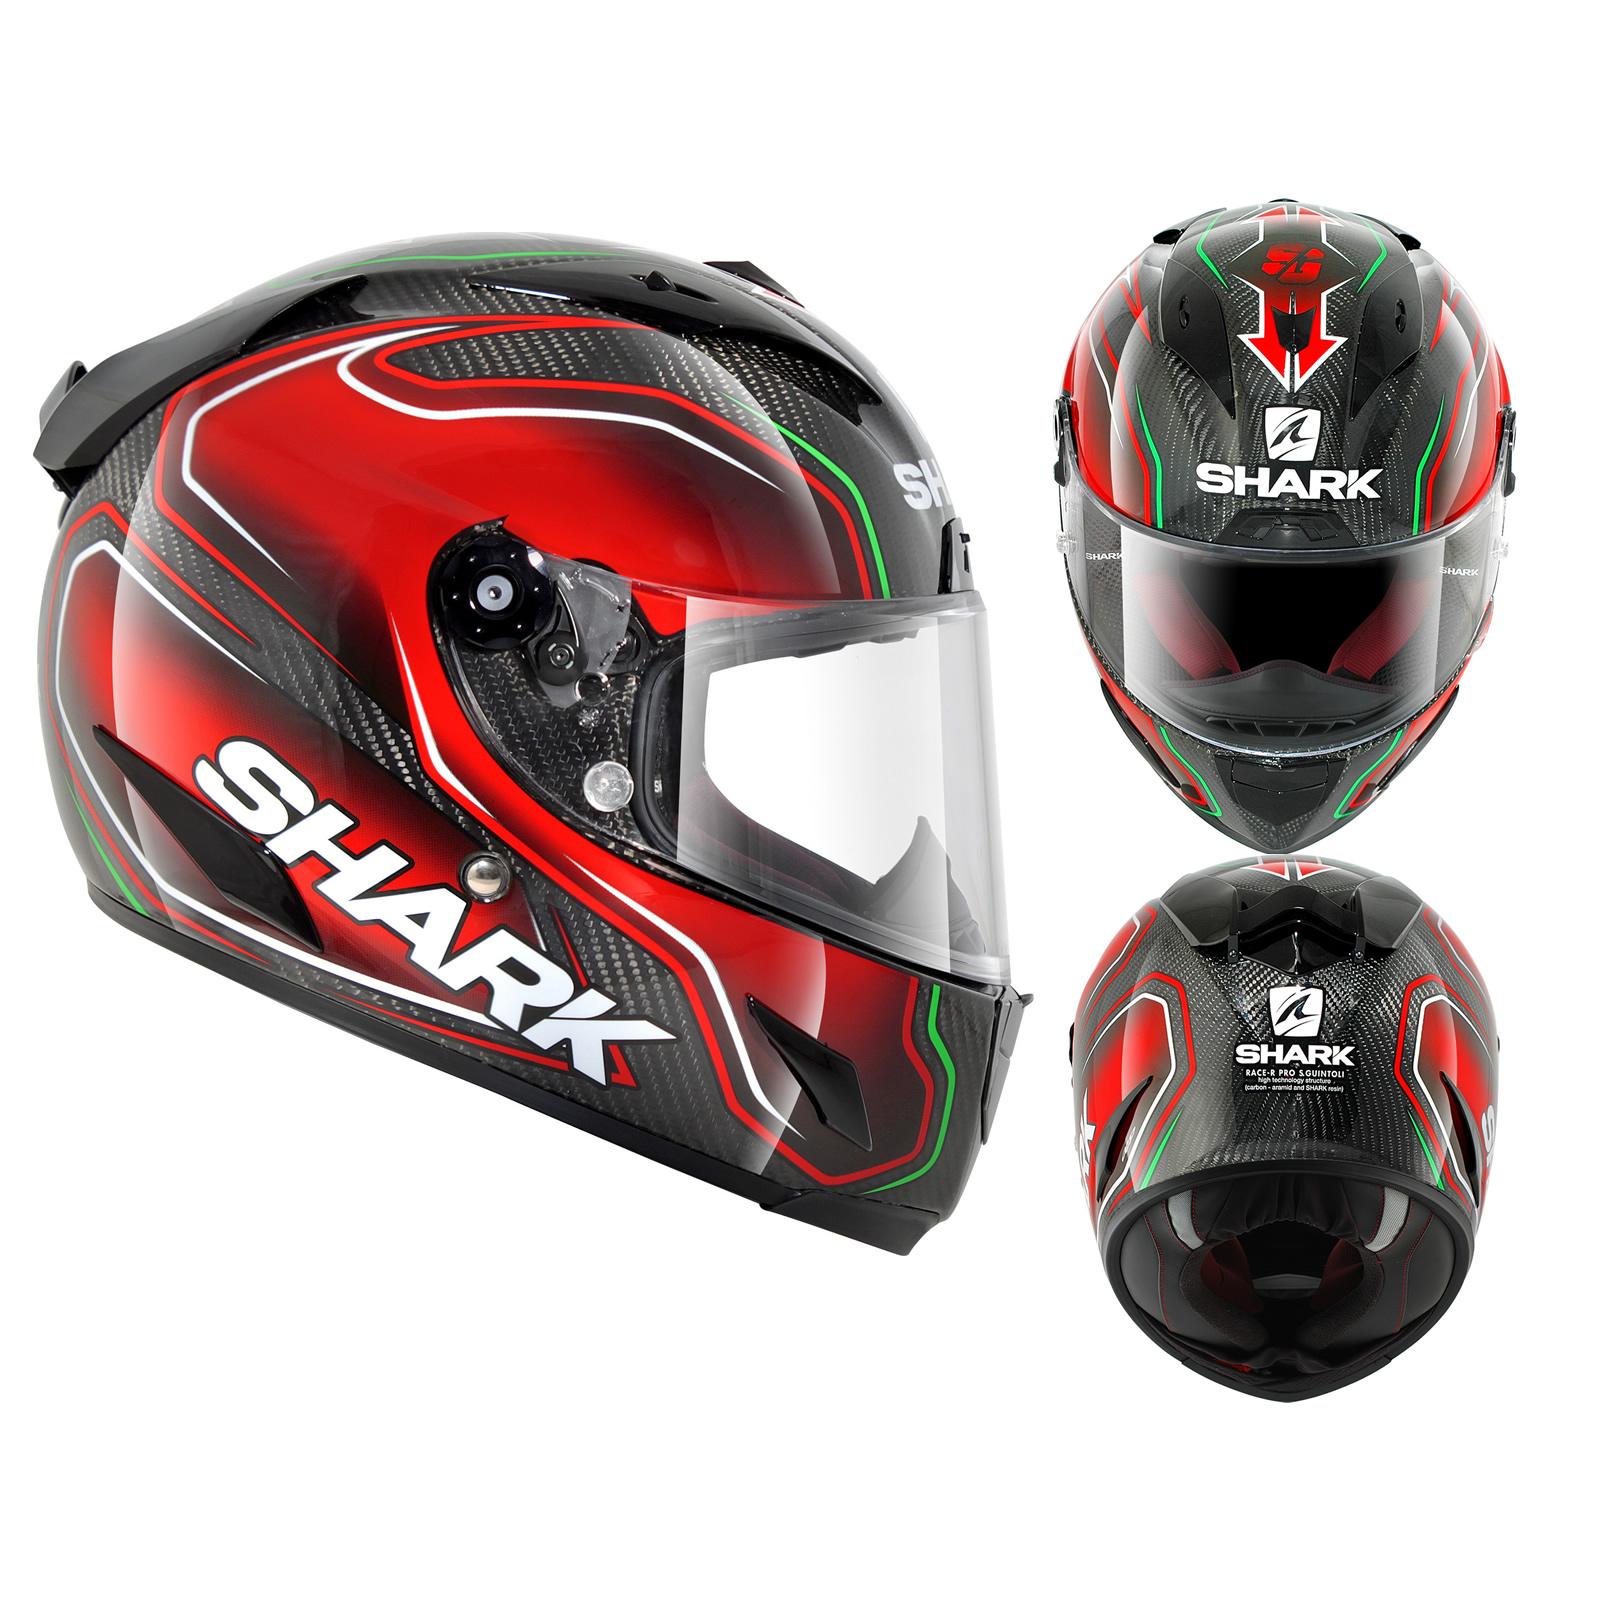 shark race r pro carbon guintoli motorcycle helmet full face helmets. Black Bedroom Furniture Sets. Home Design Ideas